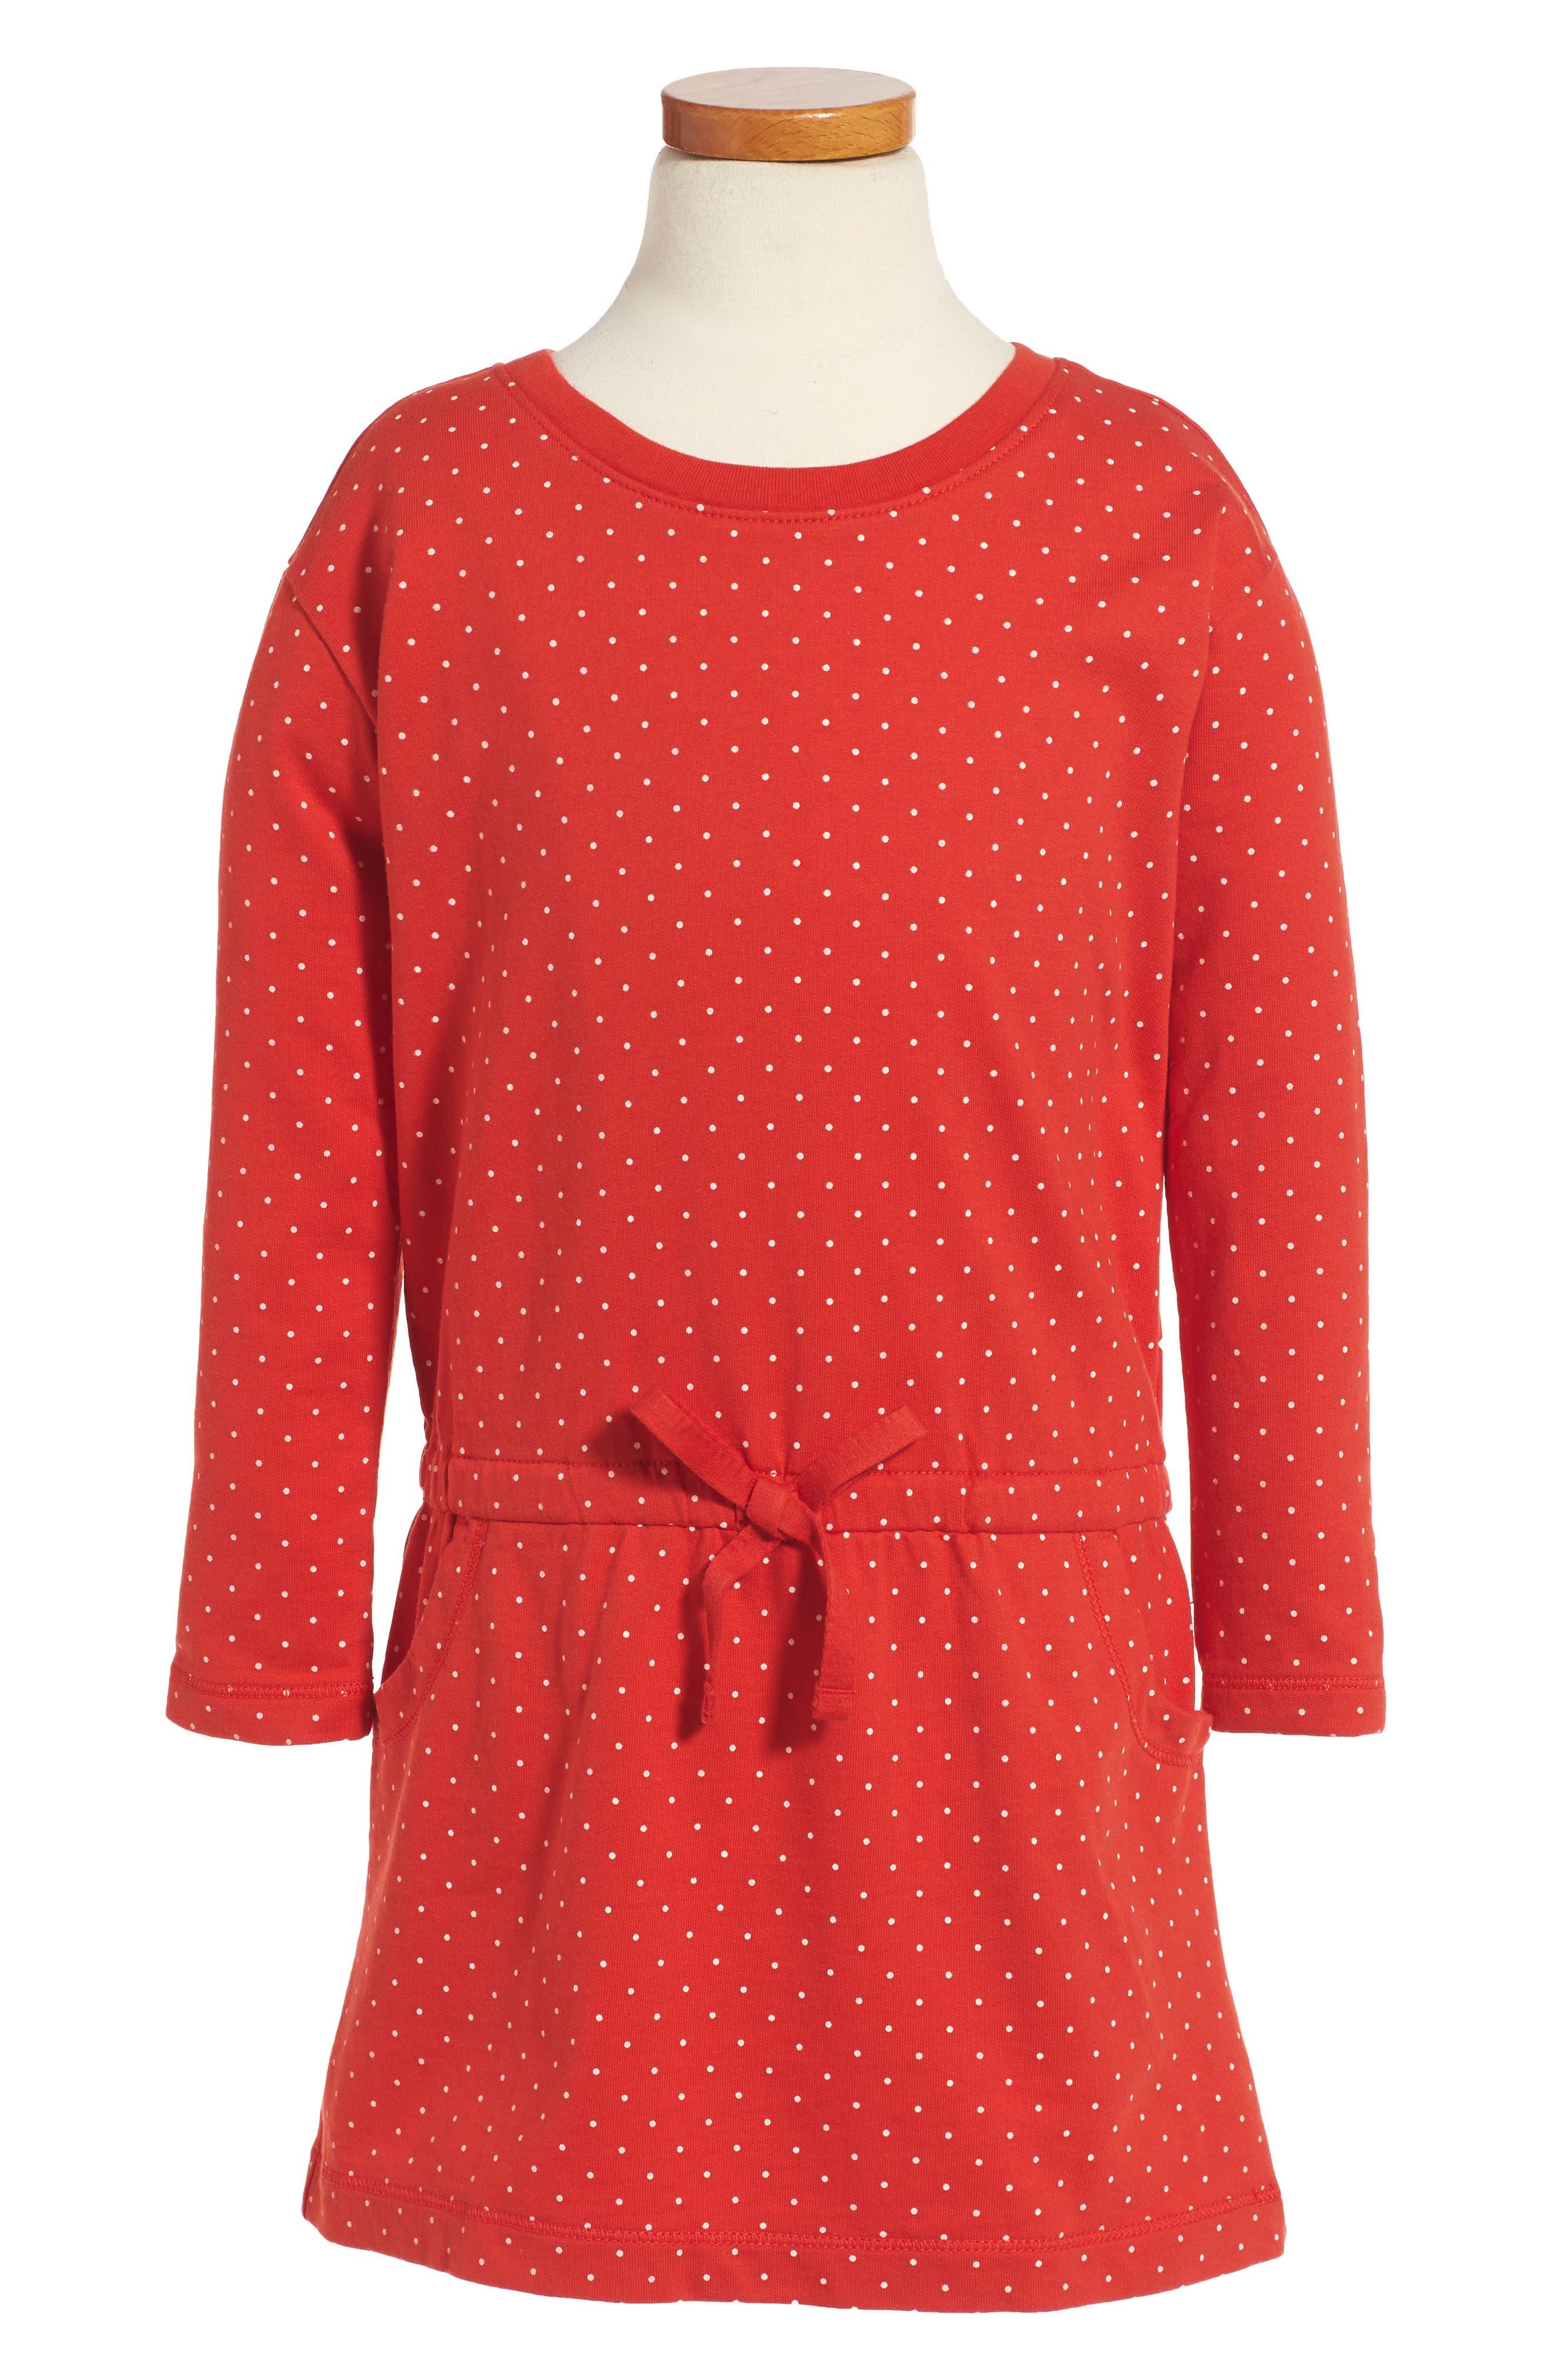 Dotty Dress,                             Main thumbnail 1, color,                             629